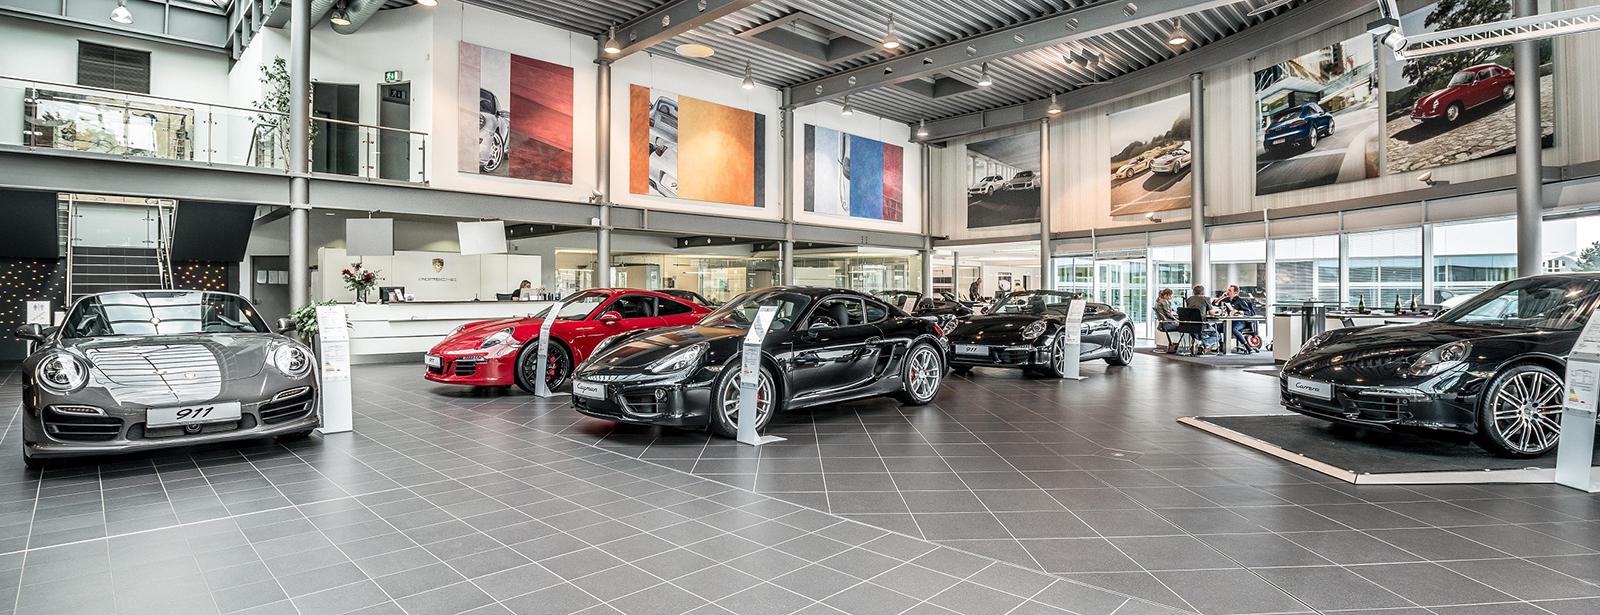 Porsche Neuwagen